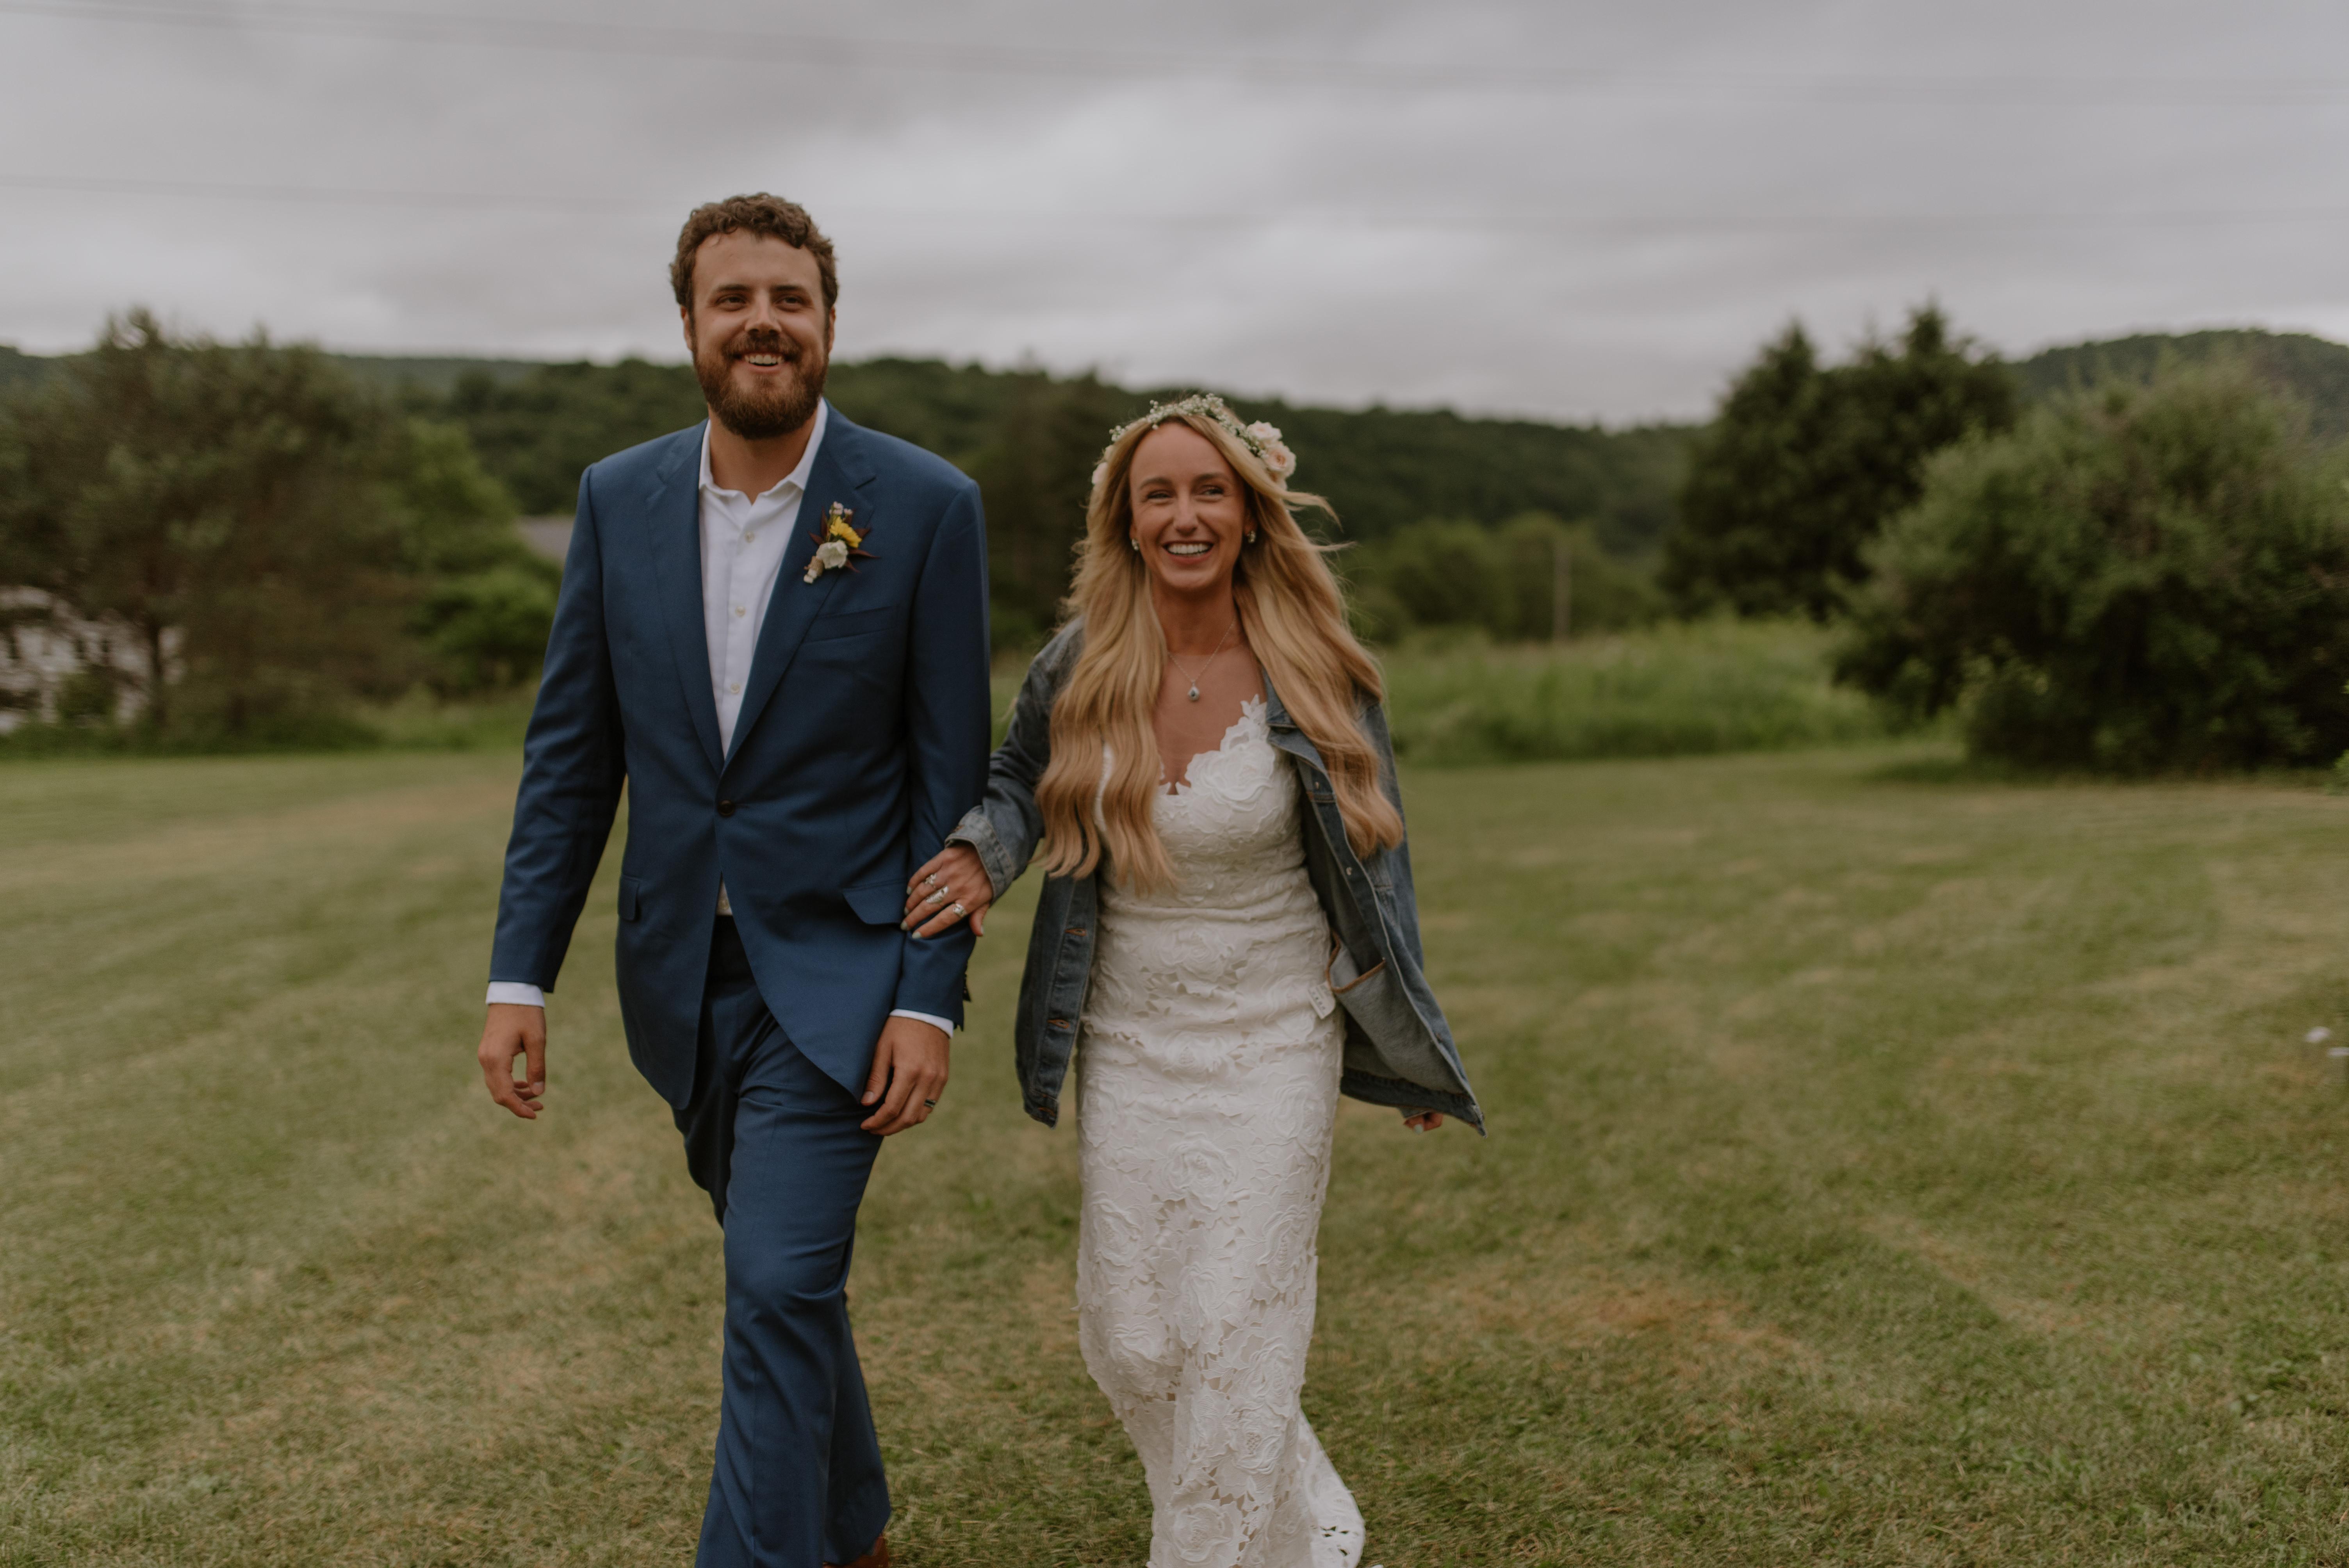 Amber-Alex-Wedding-Upstate-Catskills-Summer-Meadowlark-Stills-Lawrence-Braun--0407